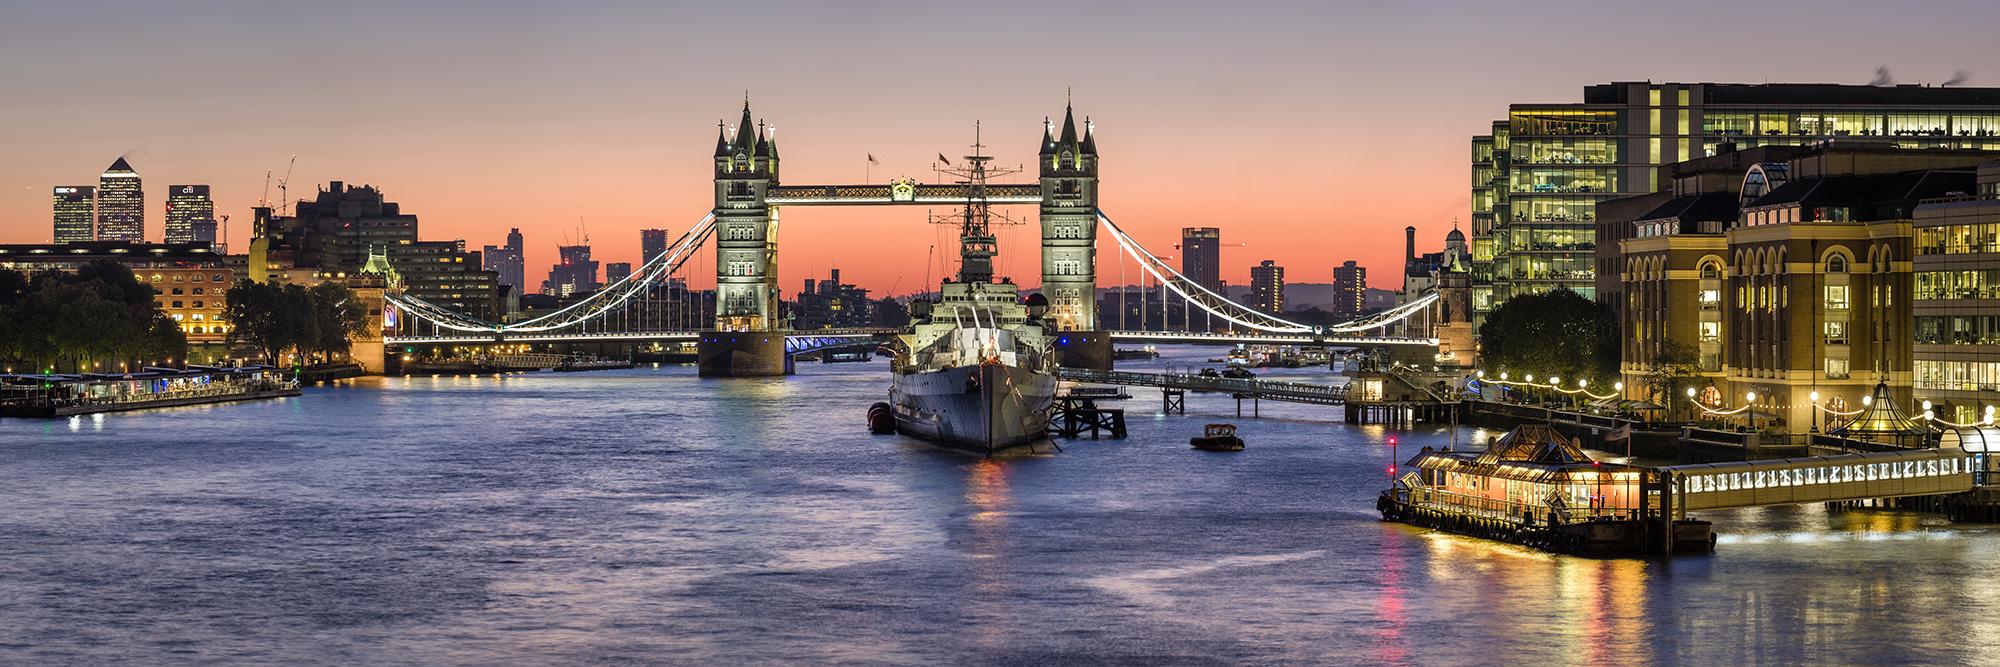 171027 - London - Sunrise - London Panoramic 001.jpg